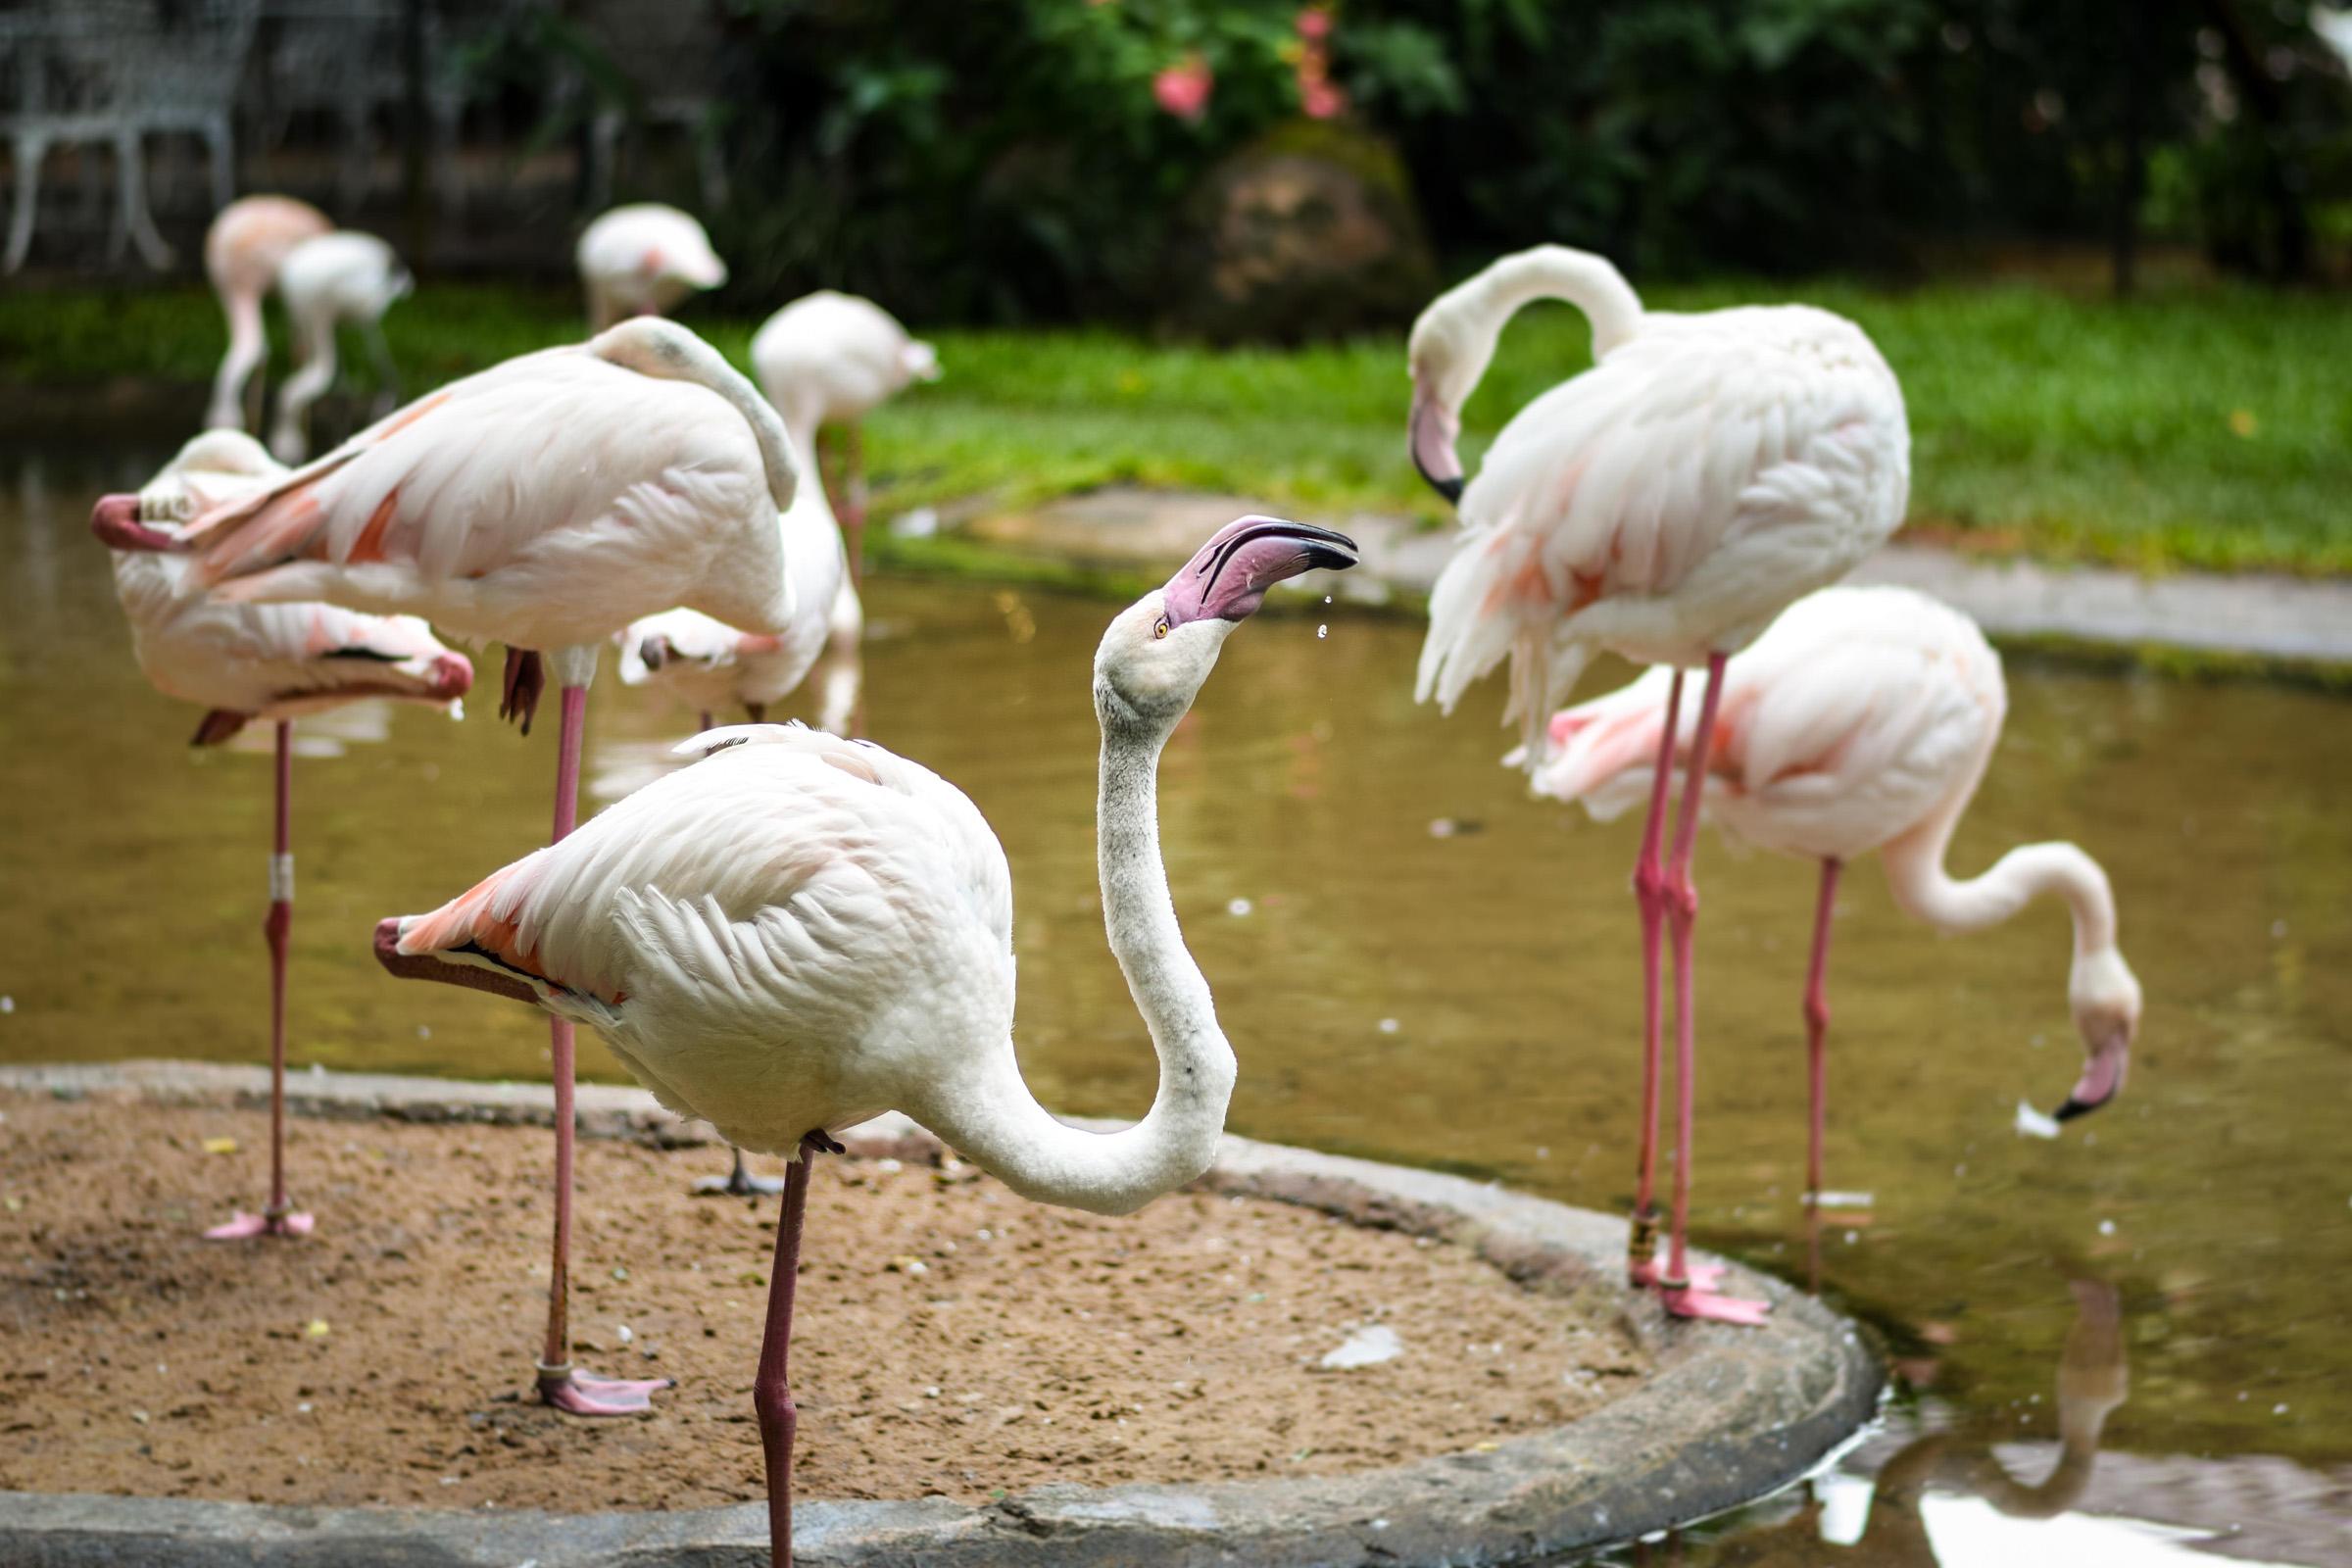 IguazuBirdPark-1.jpg